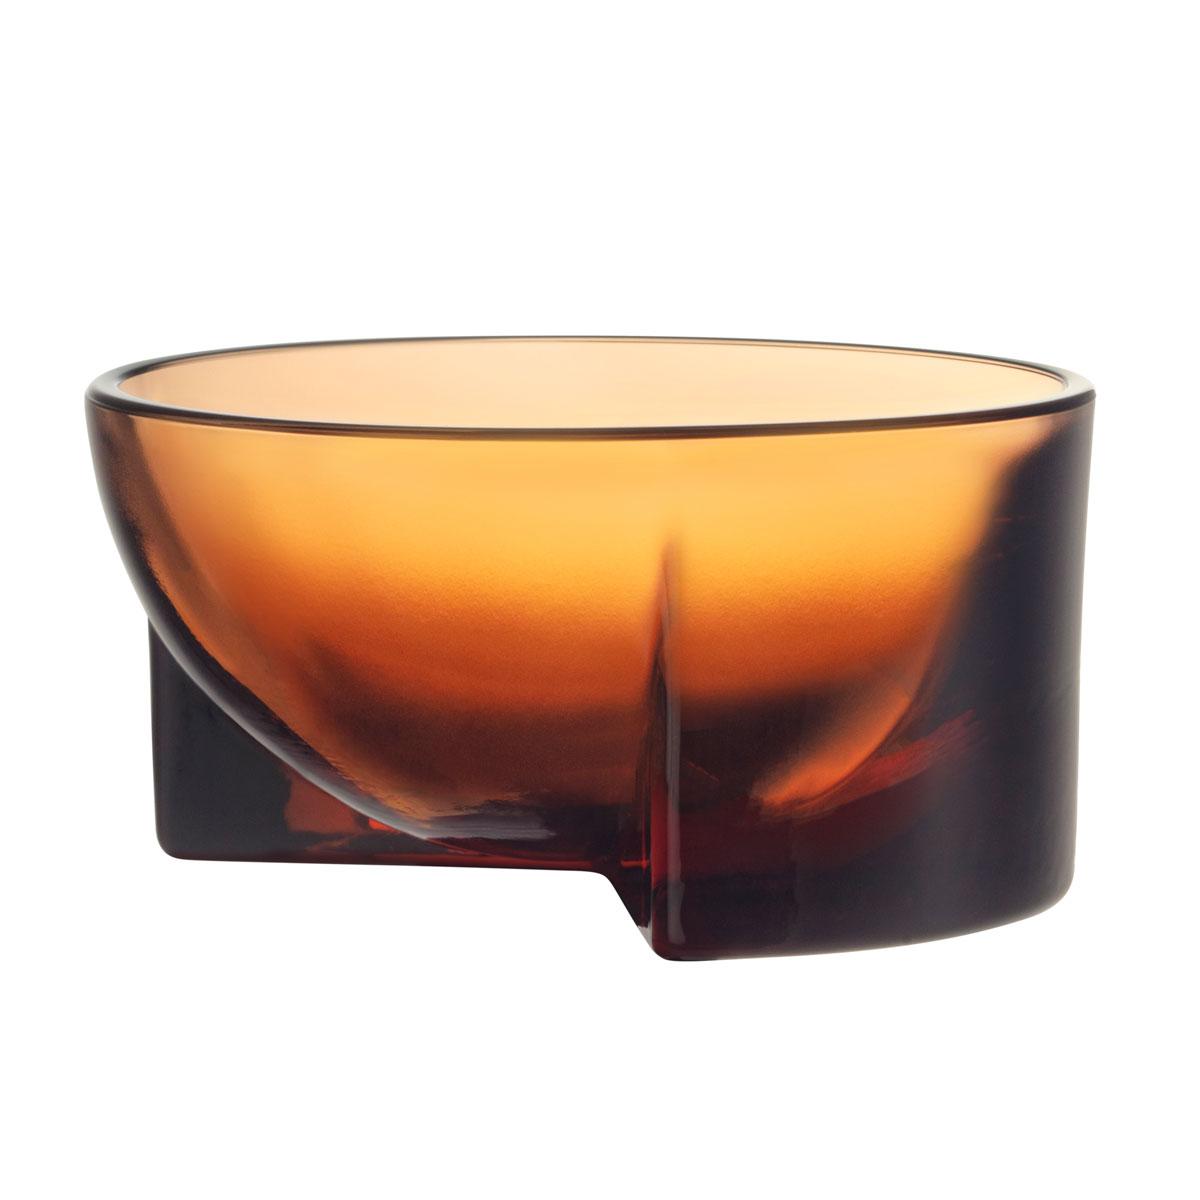 "Iittala Kuru Glass Bowl 5"" Seville Orange"